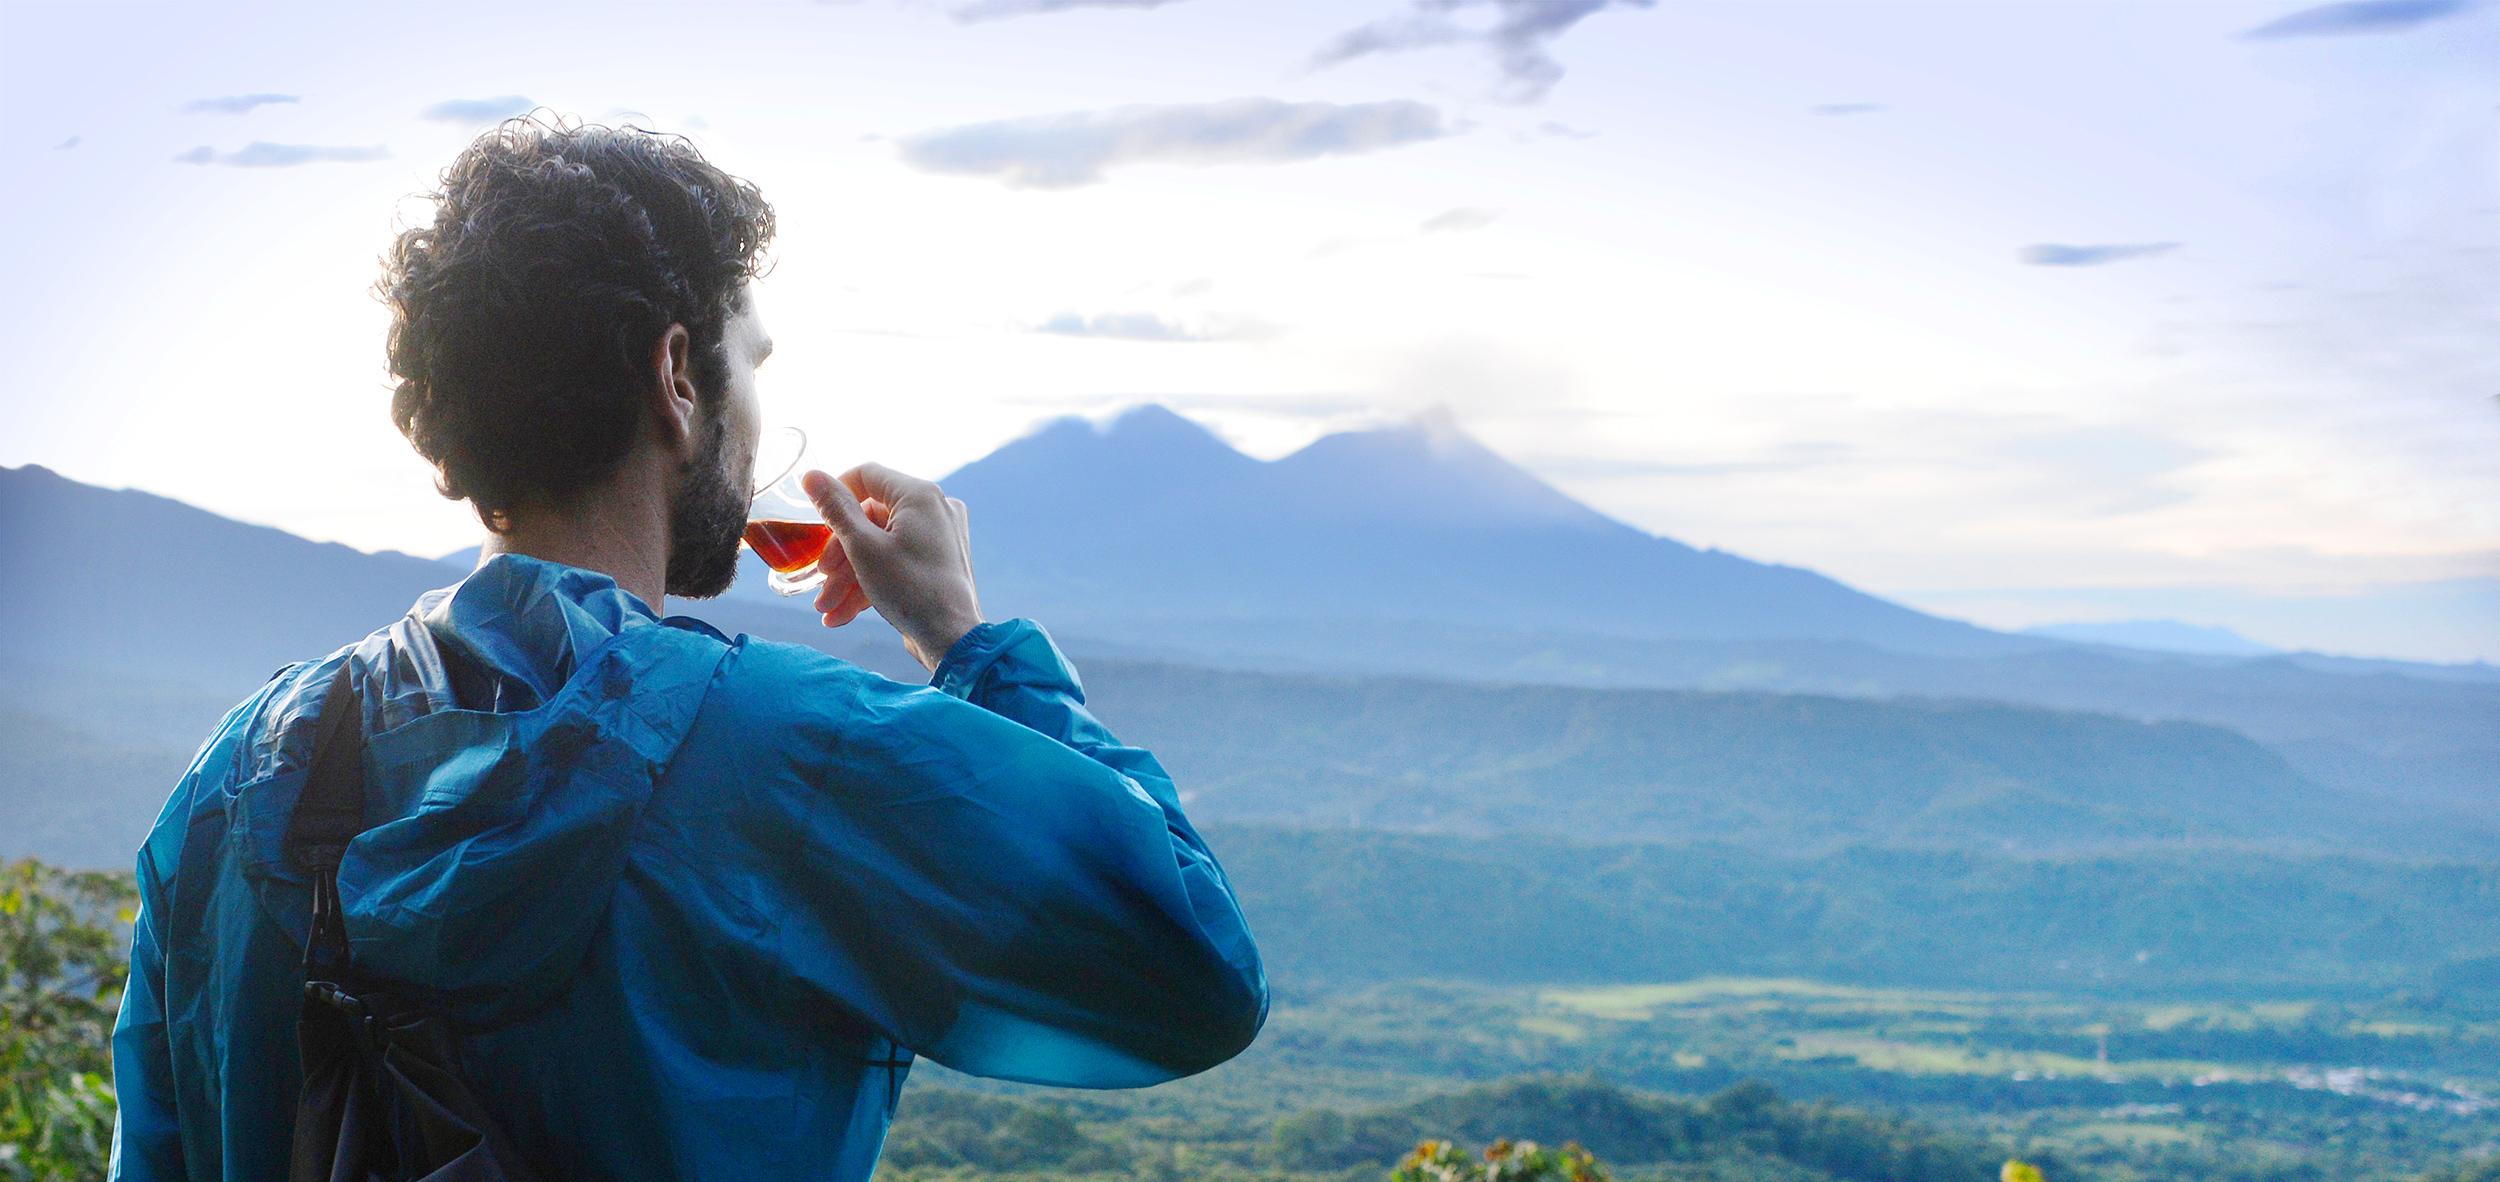 vicafe employee on a coffee farm in guatemala